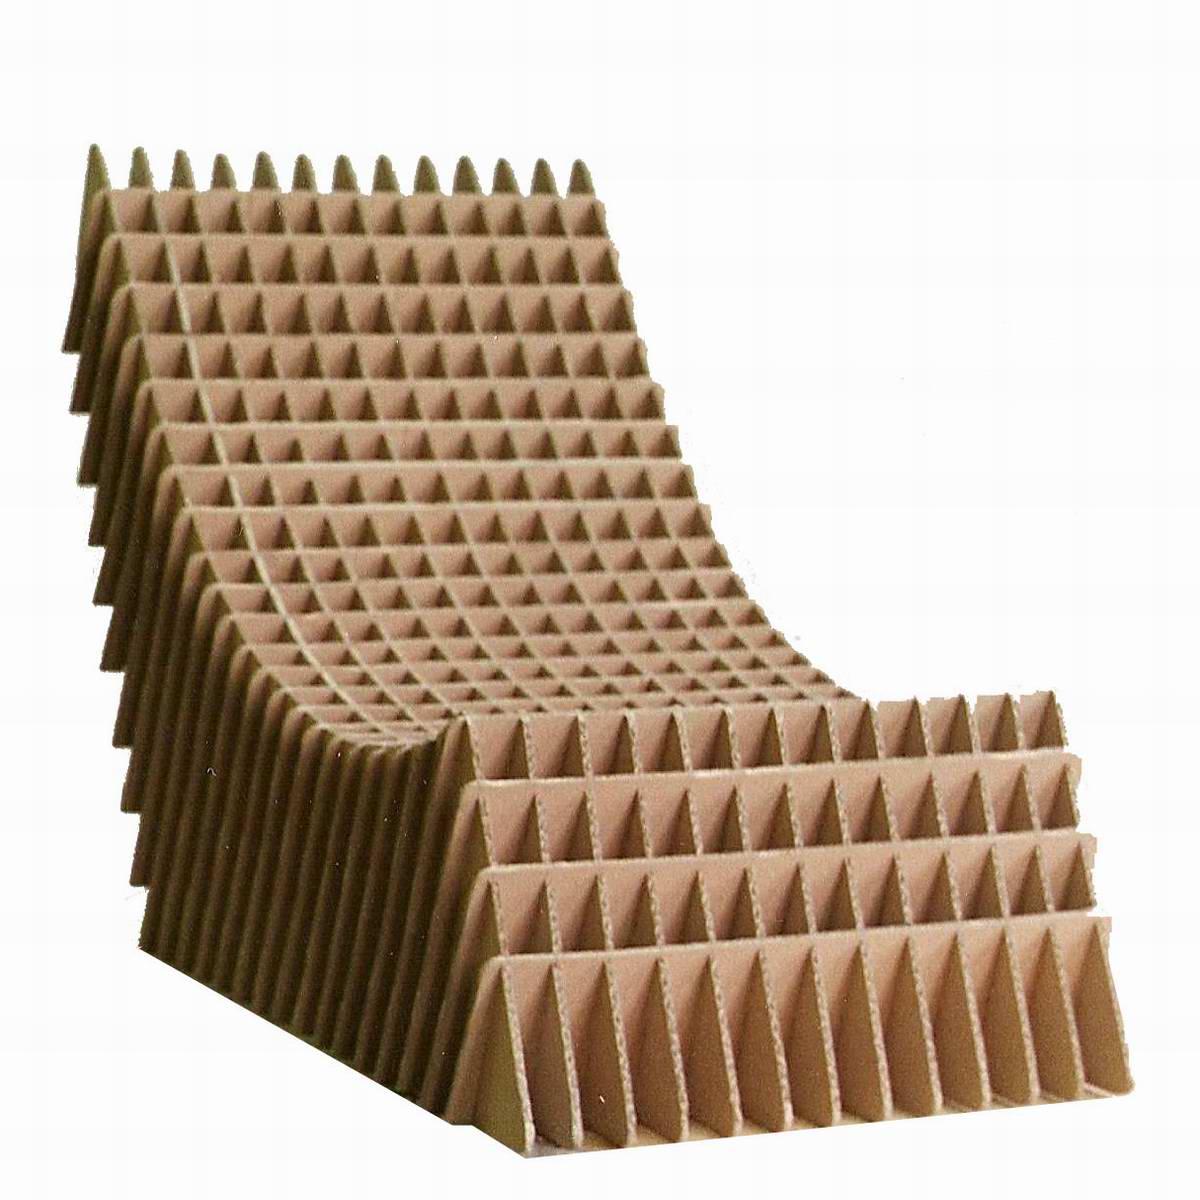 03_Piotr Pacalowski cardboard armchair 2.jpg